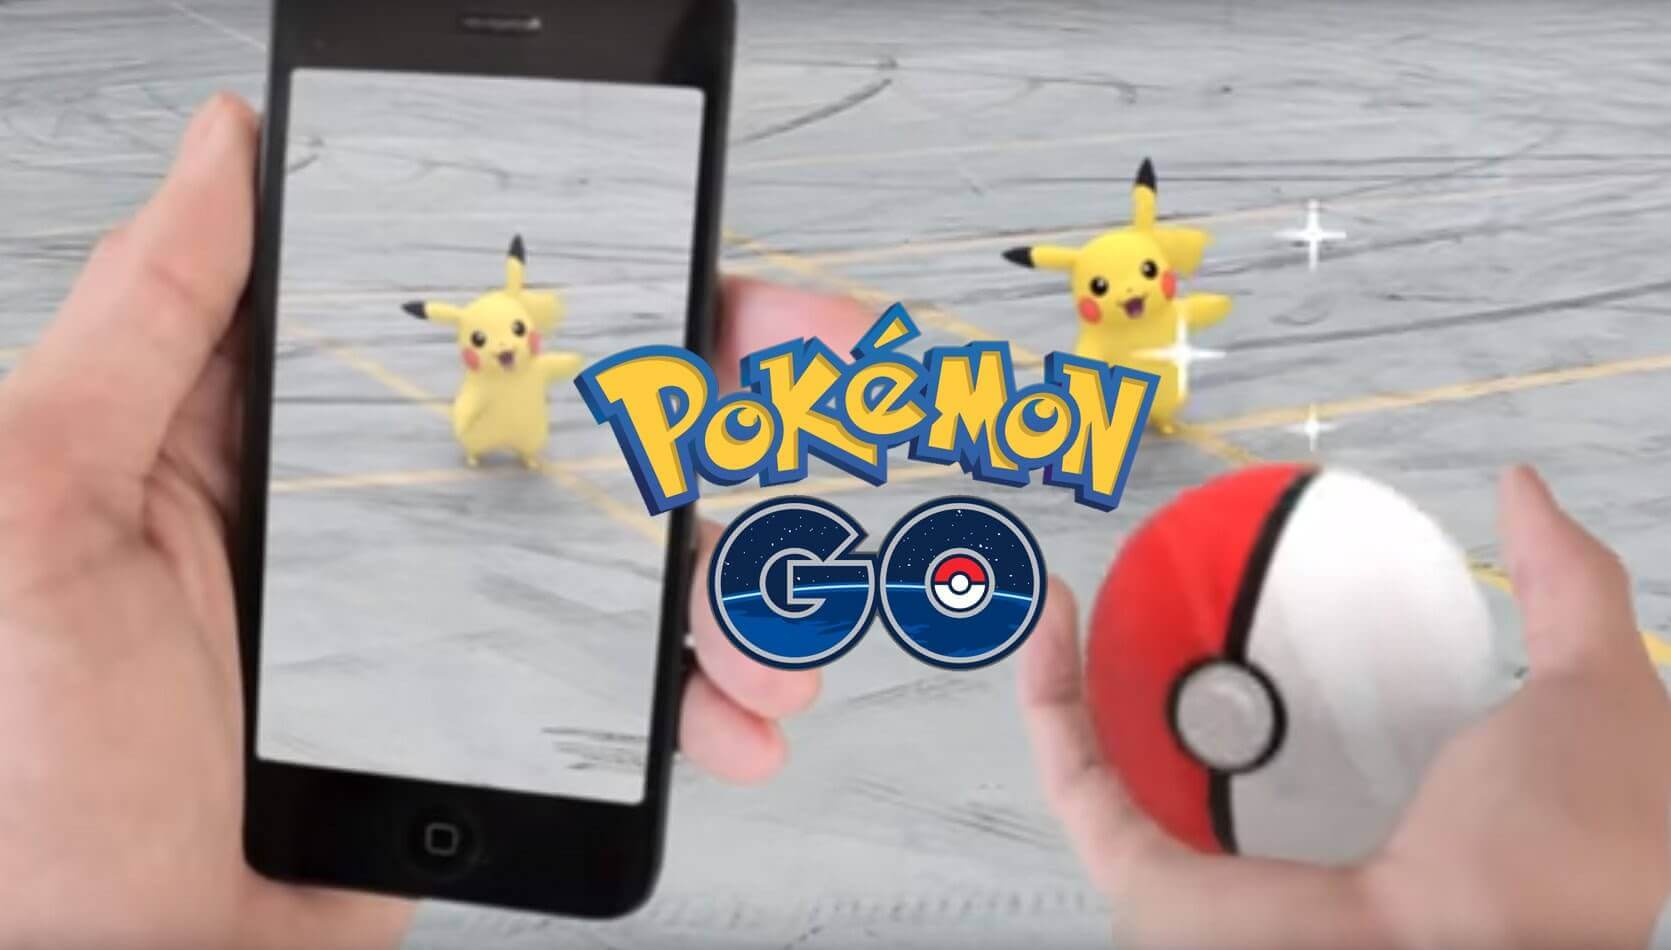 Pokémon estudiar ingles en medellin